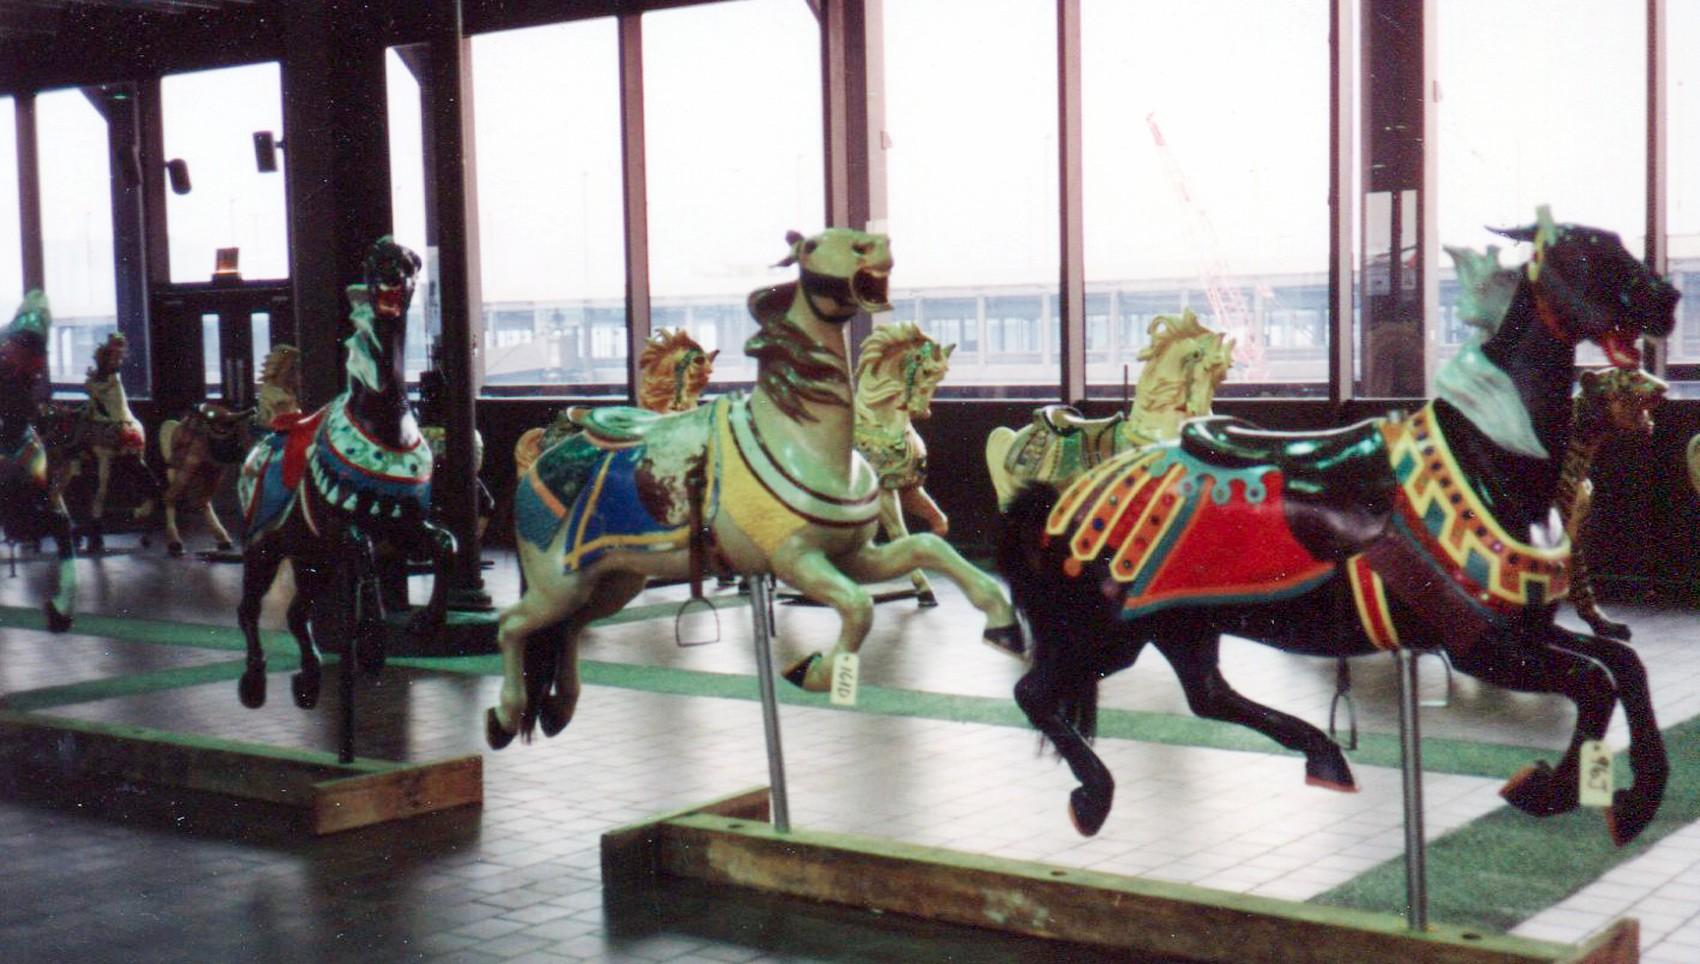 Seaside-Illions--Eldrige-Park-Carmel-carousel-horses-nyc-1989